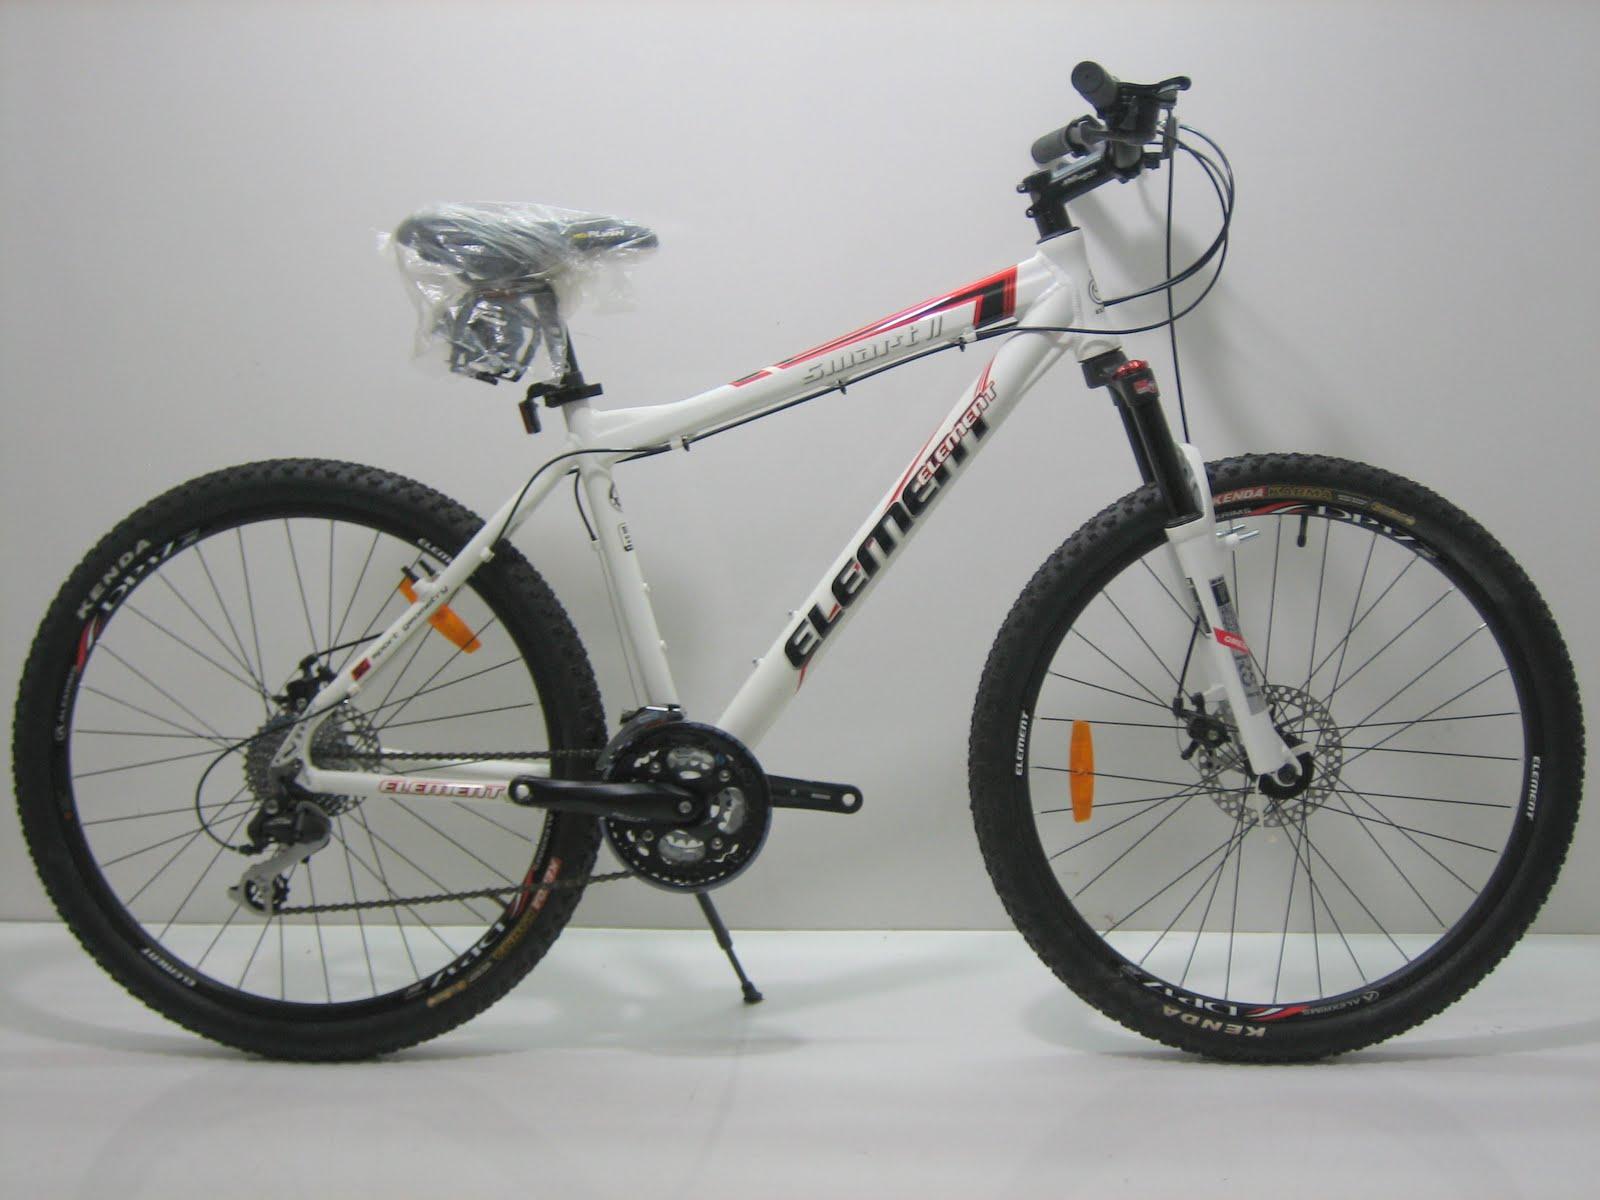 tokomagenta: A Showcase of Products: Sepeda Gunung ELEMENT